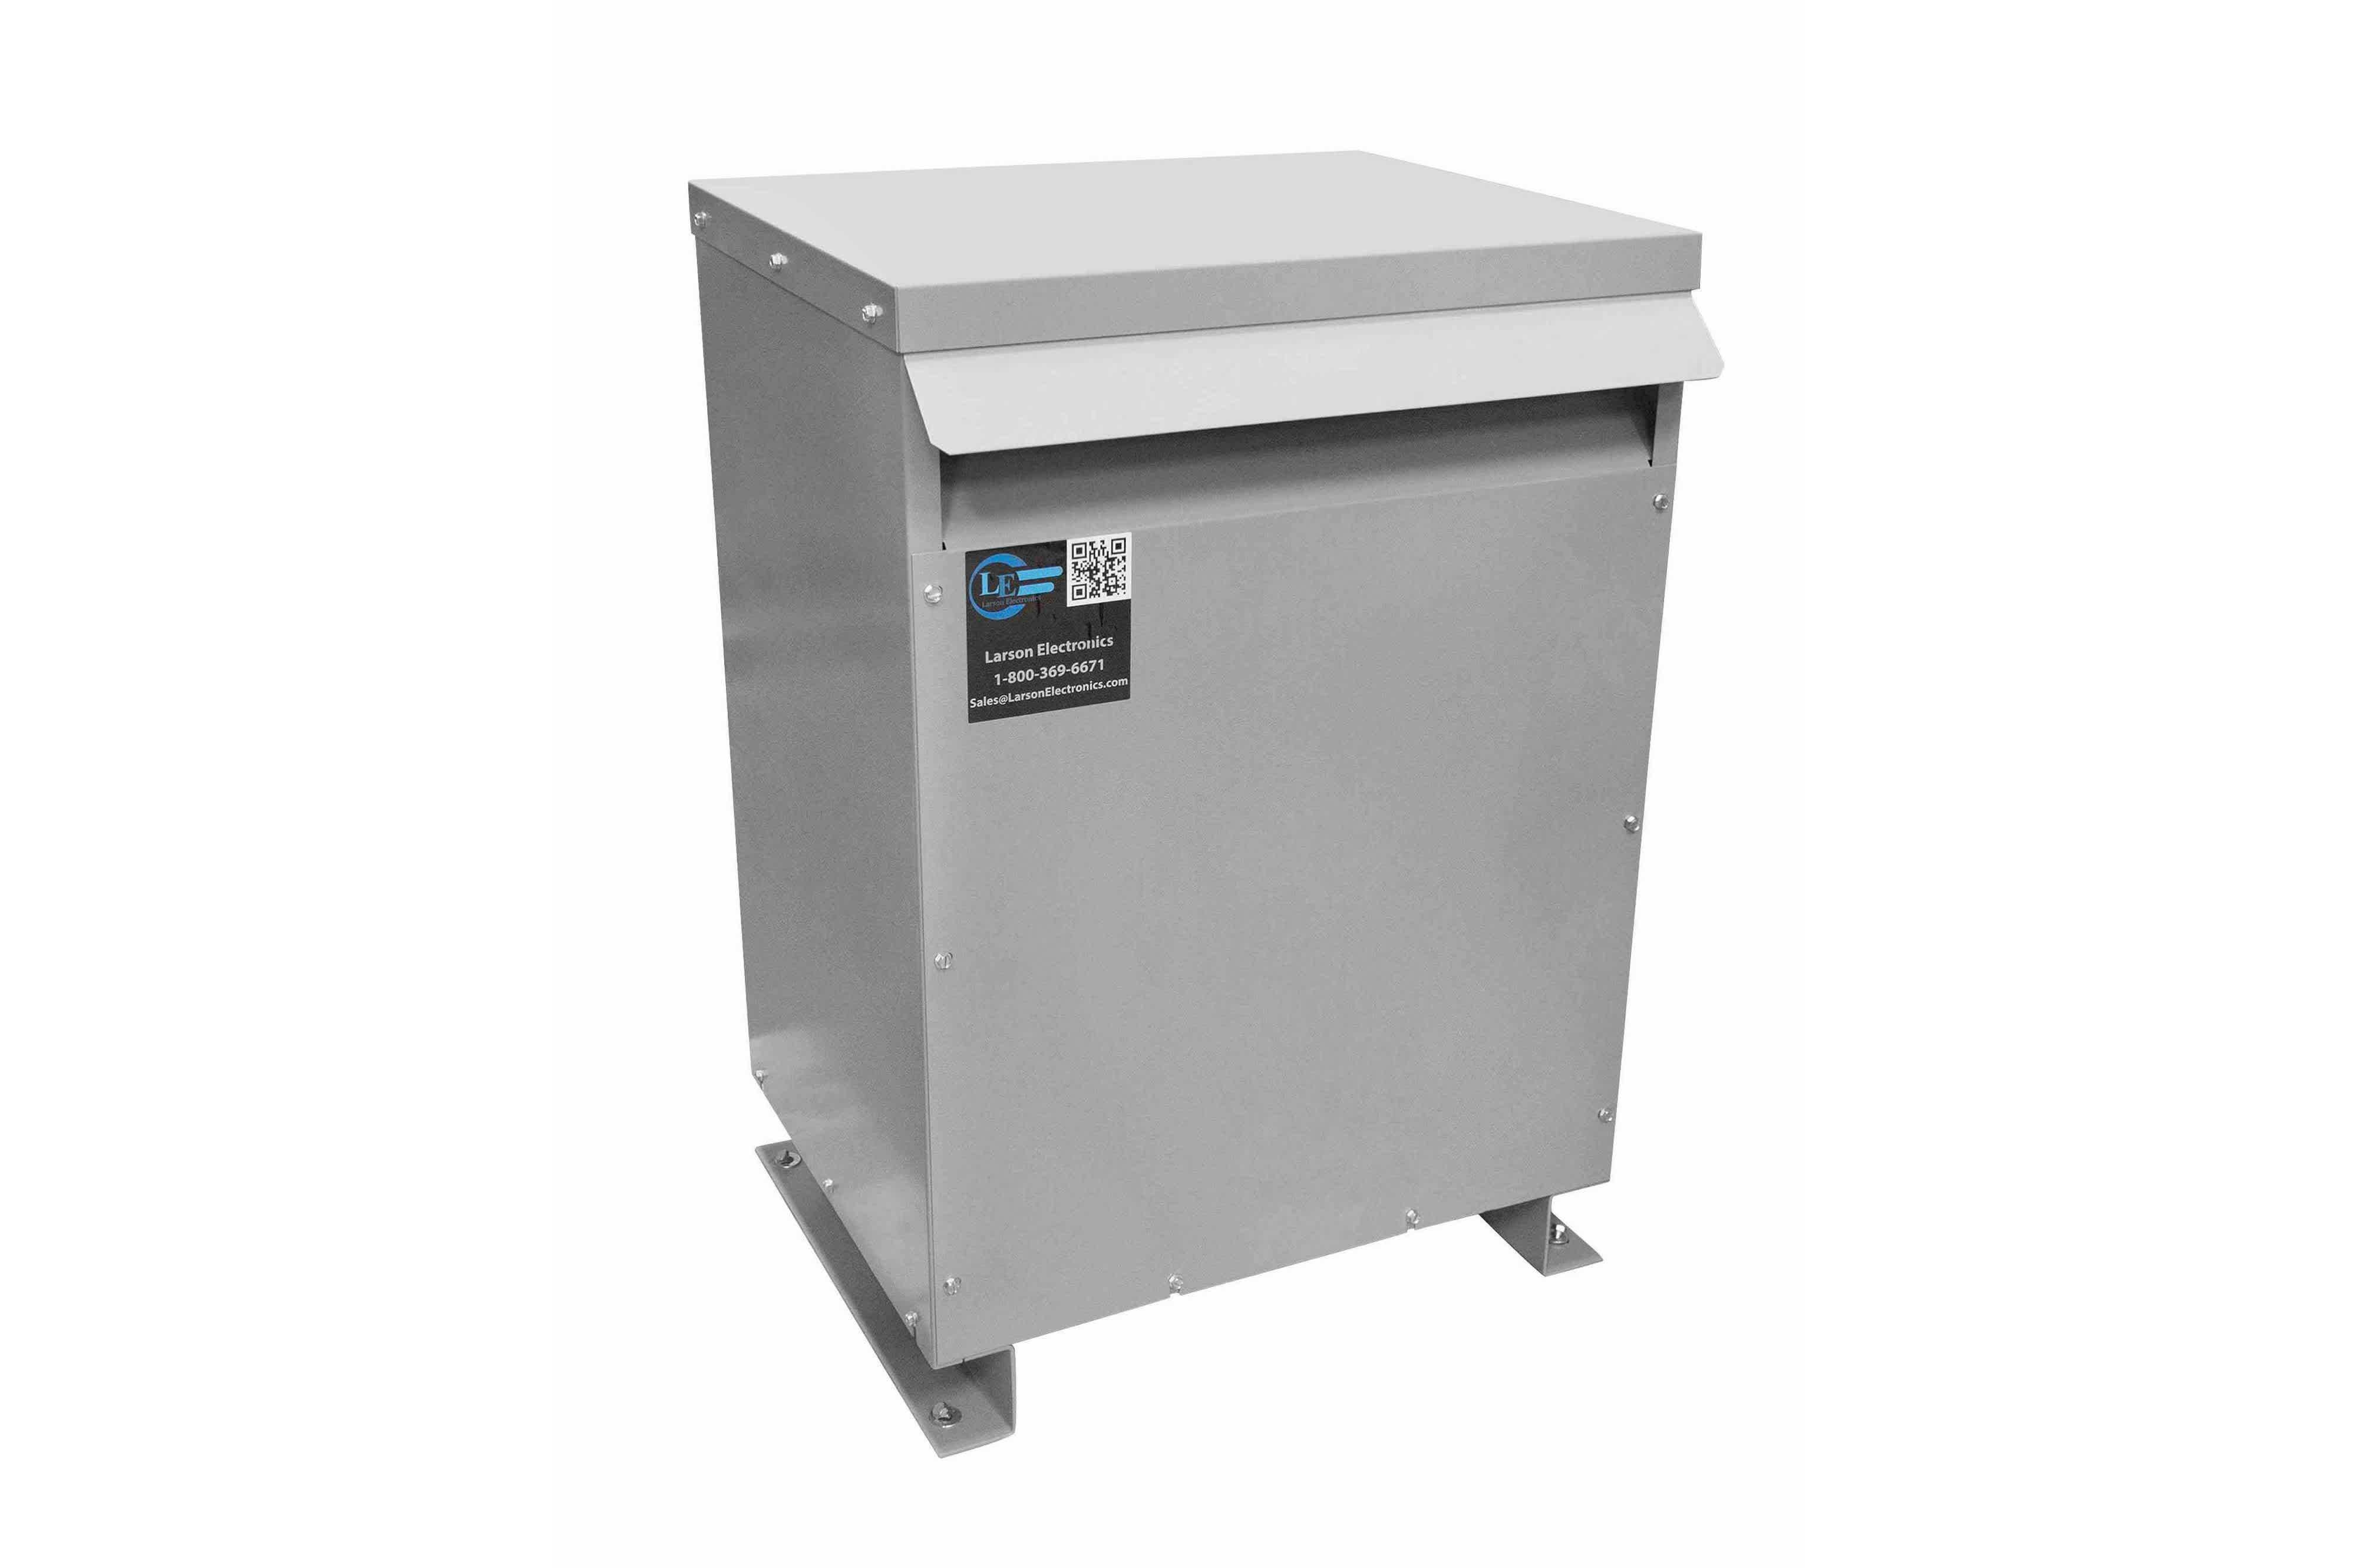 115 kVA 3PH Isolation Transformer, 480V Wye Primary, 415Y/240 Wye-N Secondary, N3R, Ventilated, 60 Hz